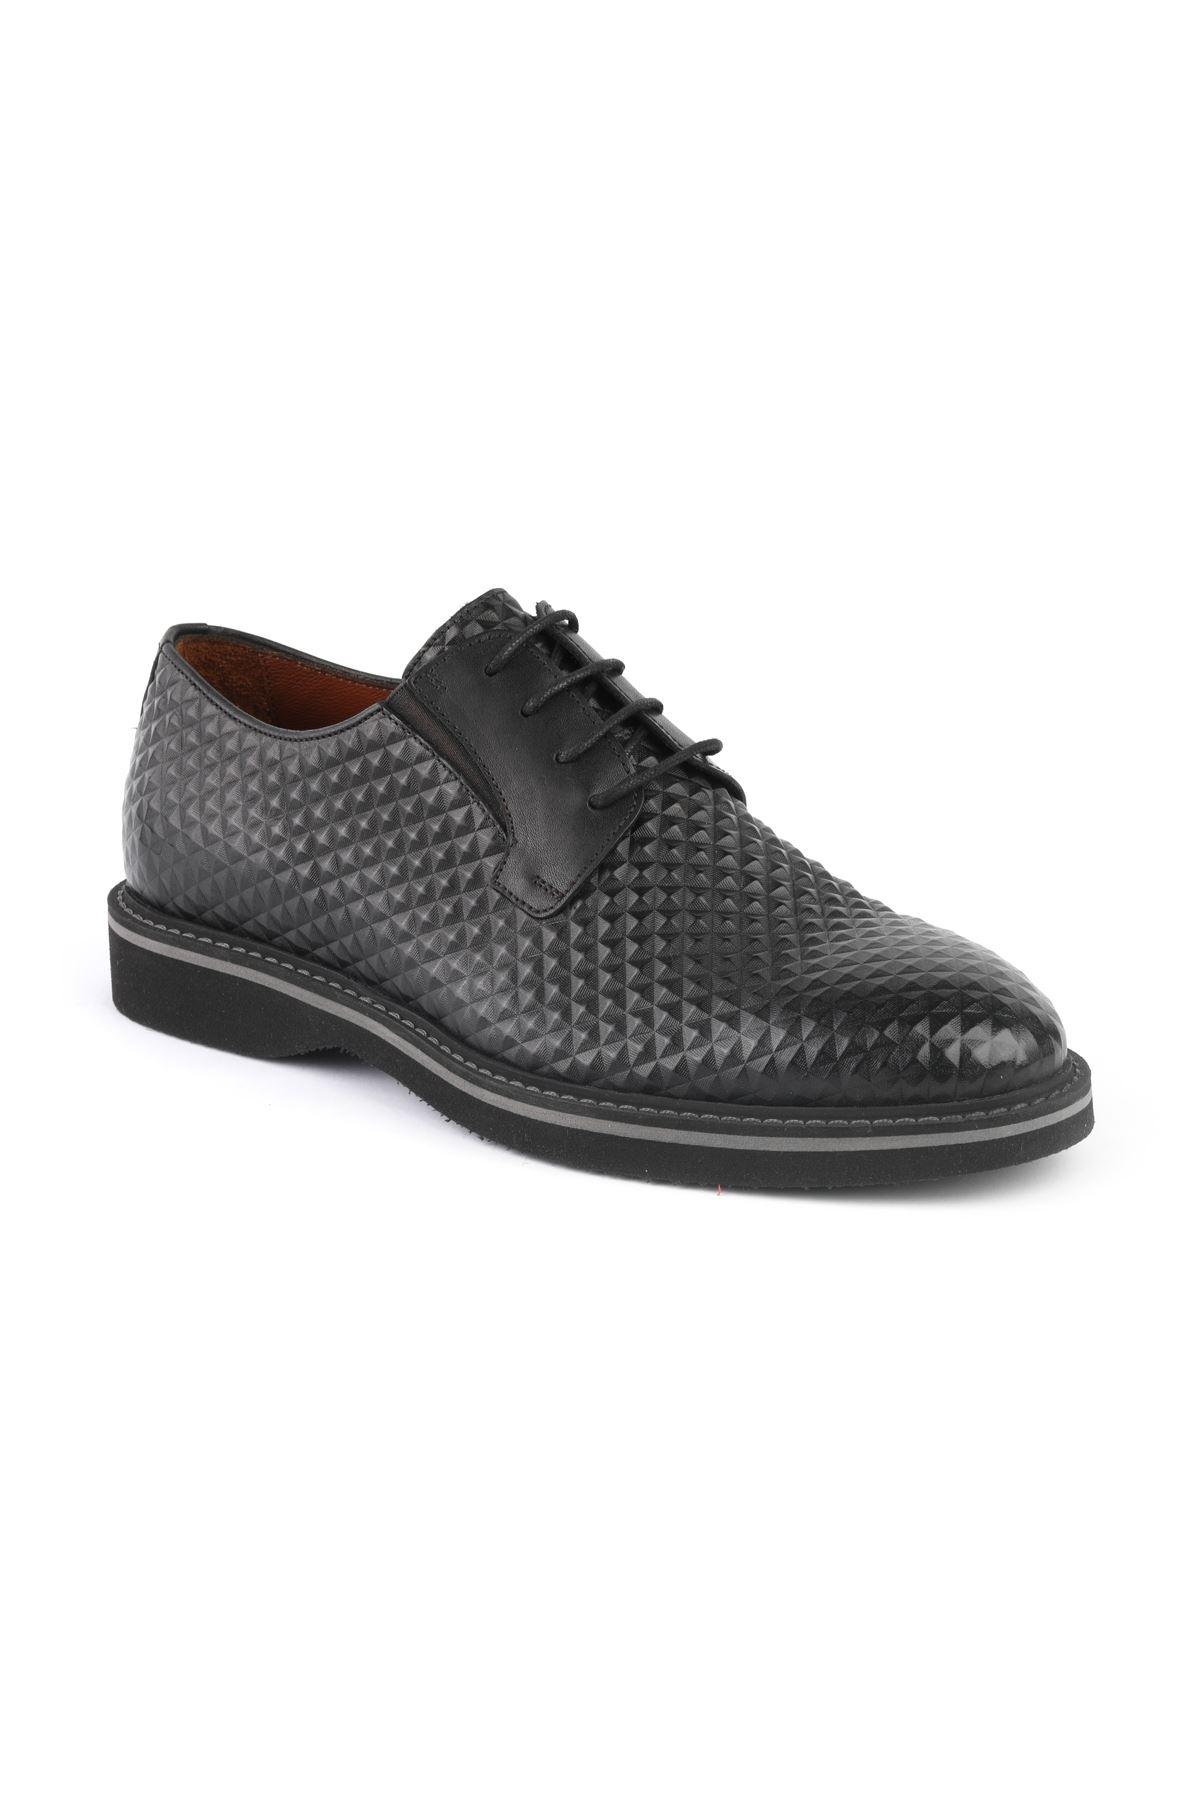 Libero T1254 Black Oxford Shoes